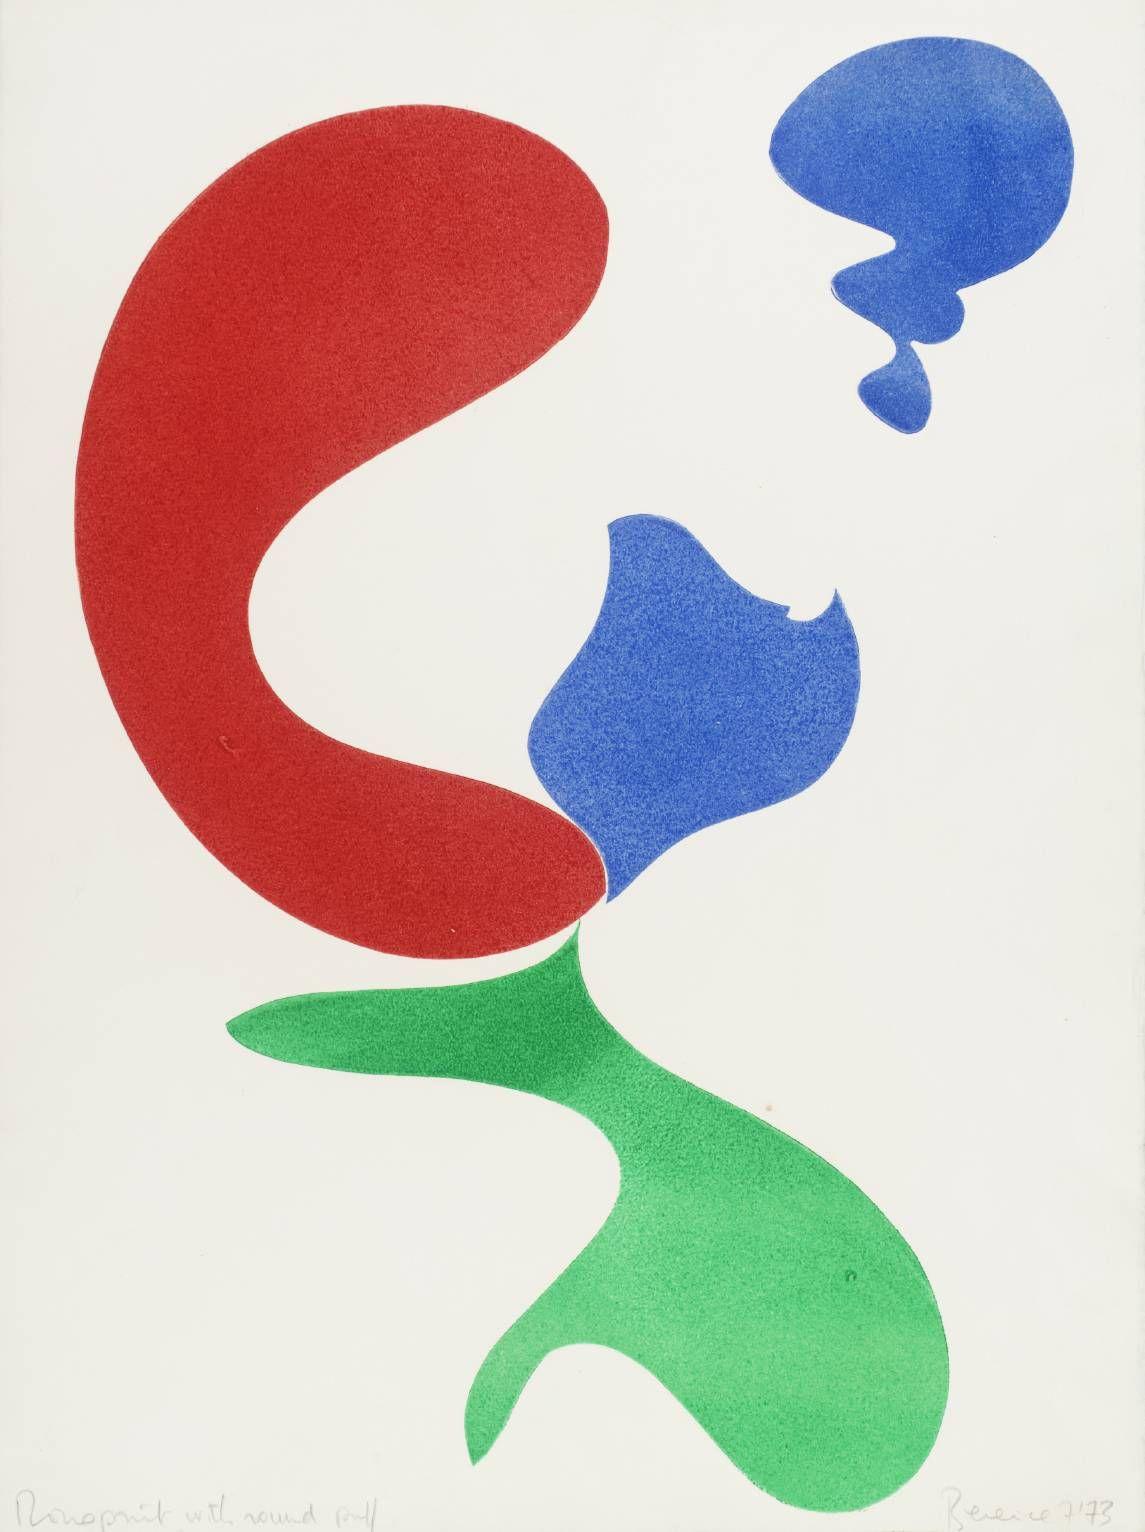 Berenice Sydney 'Monoprint with Round Puff', 1973 © The estate of Bernice Sydney